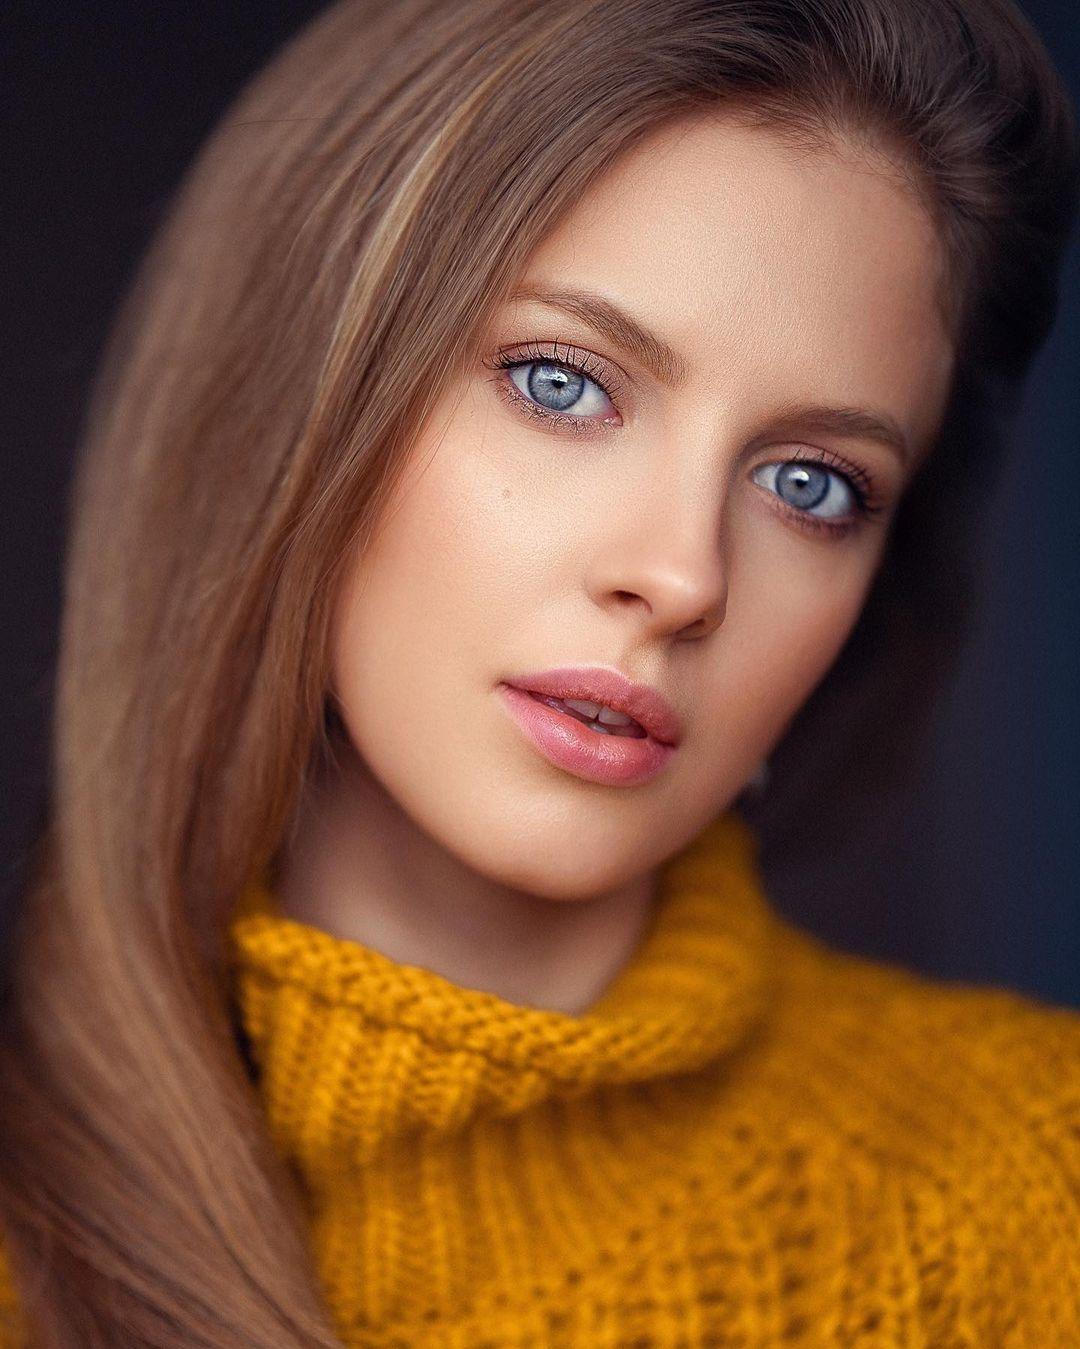 Nicole-marie-j-Wallpapers-Insta-Fit-Bio-13